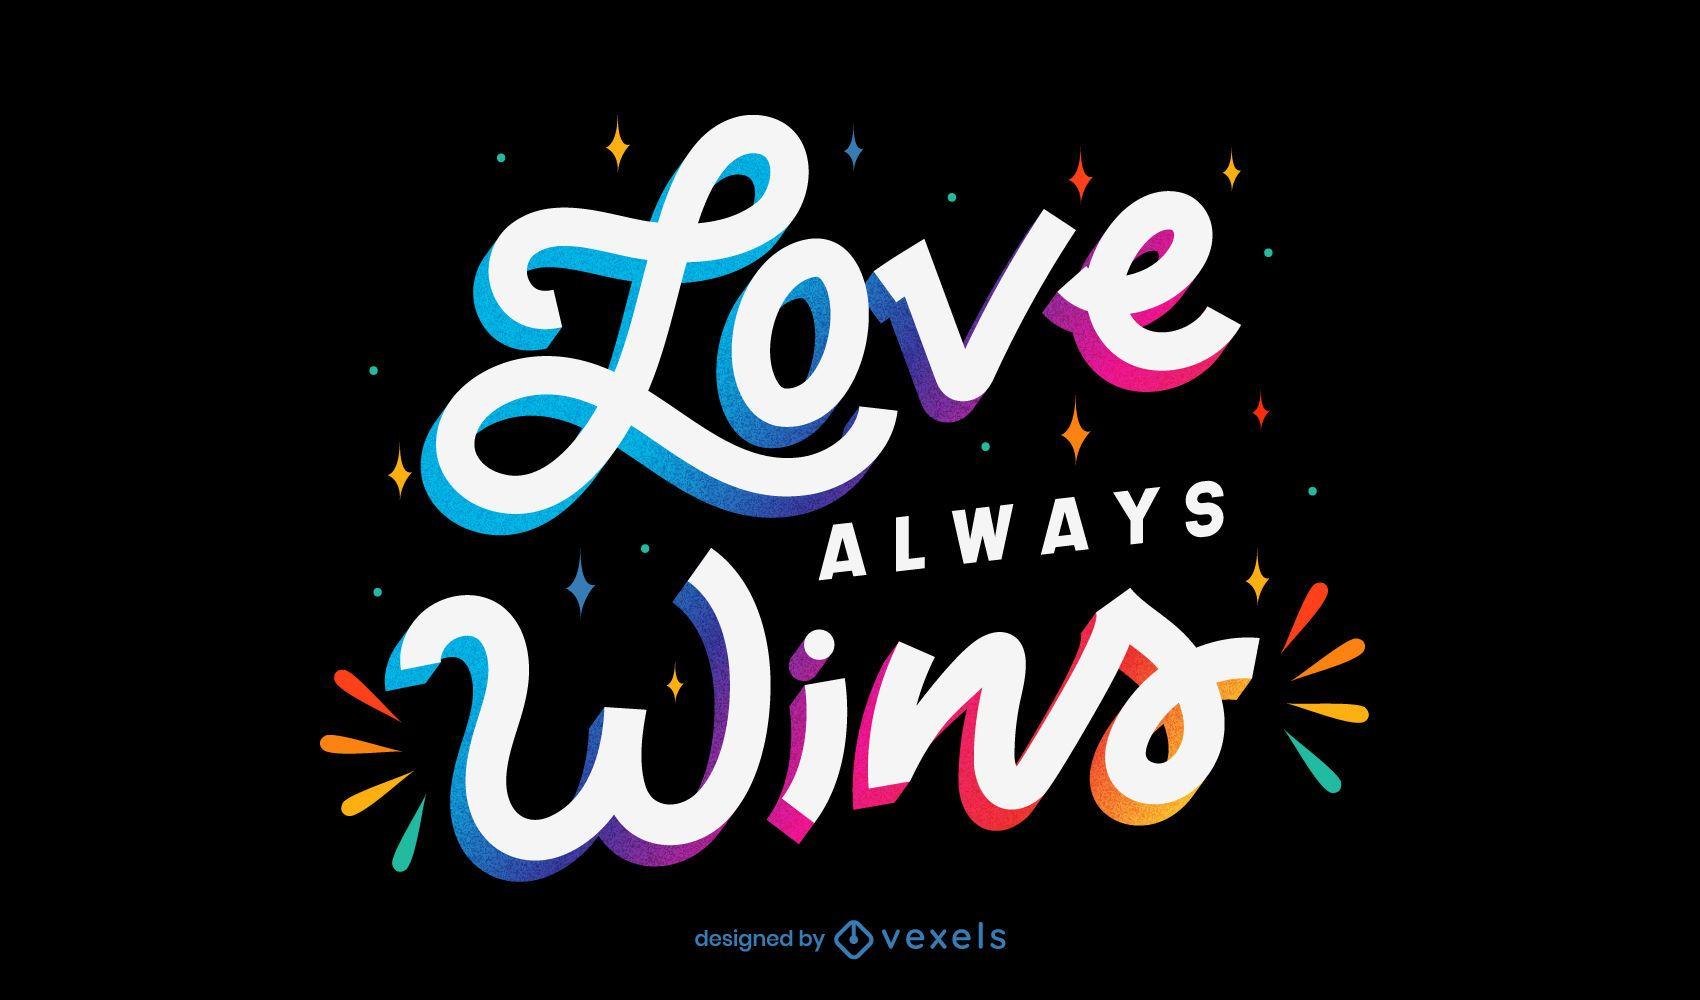 Love always wins lettering design